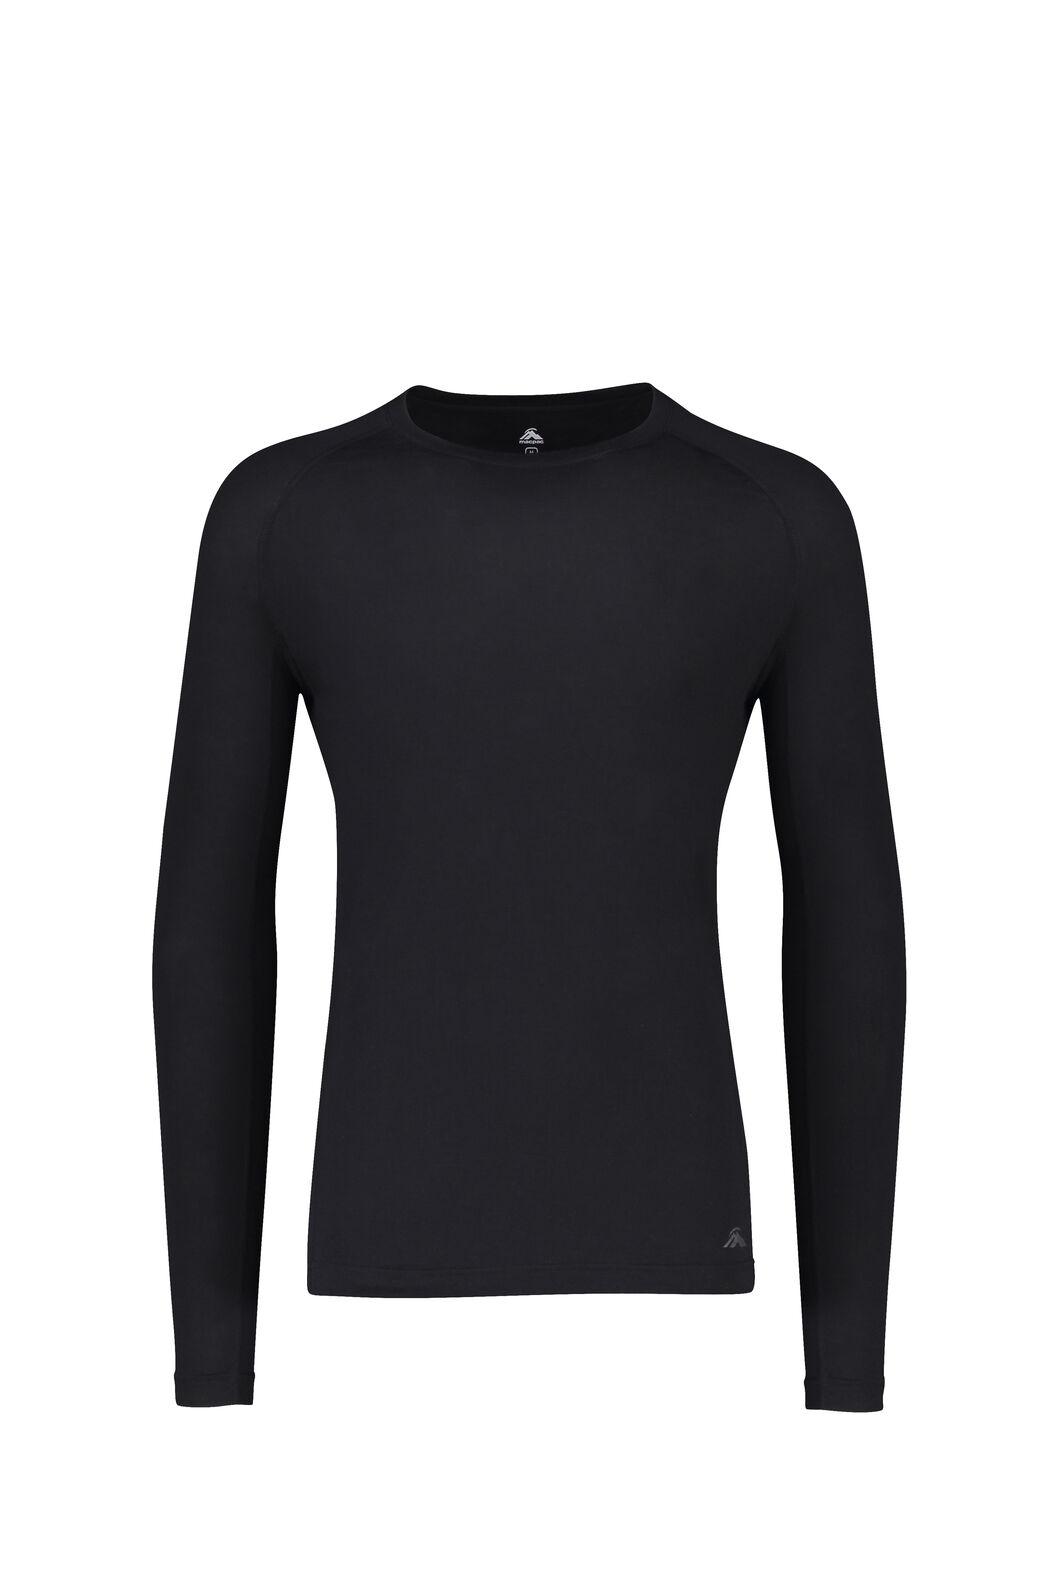 Macpac 150 Merino Long Sleeve Top — Men's, Black, hi-res